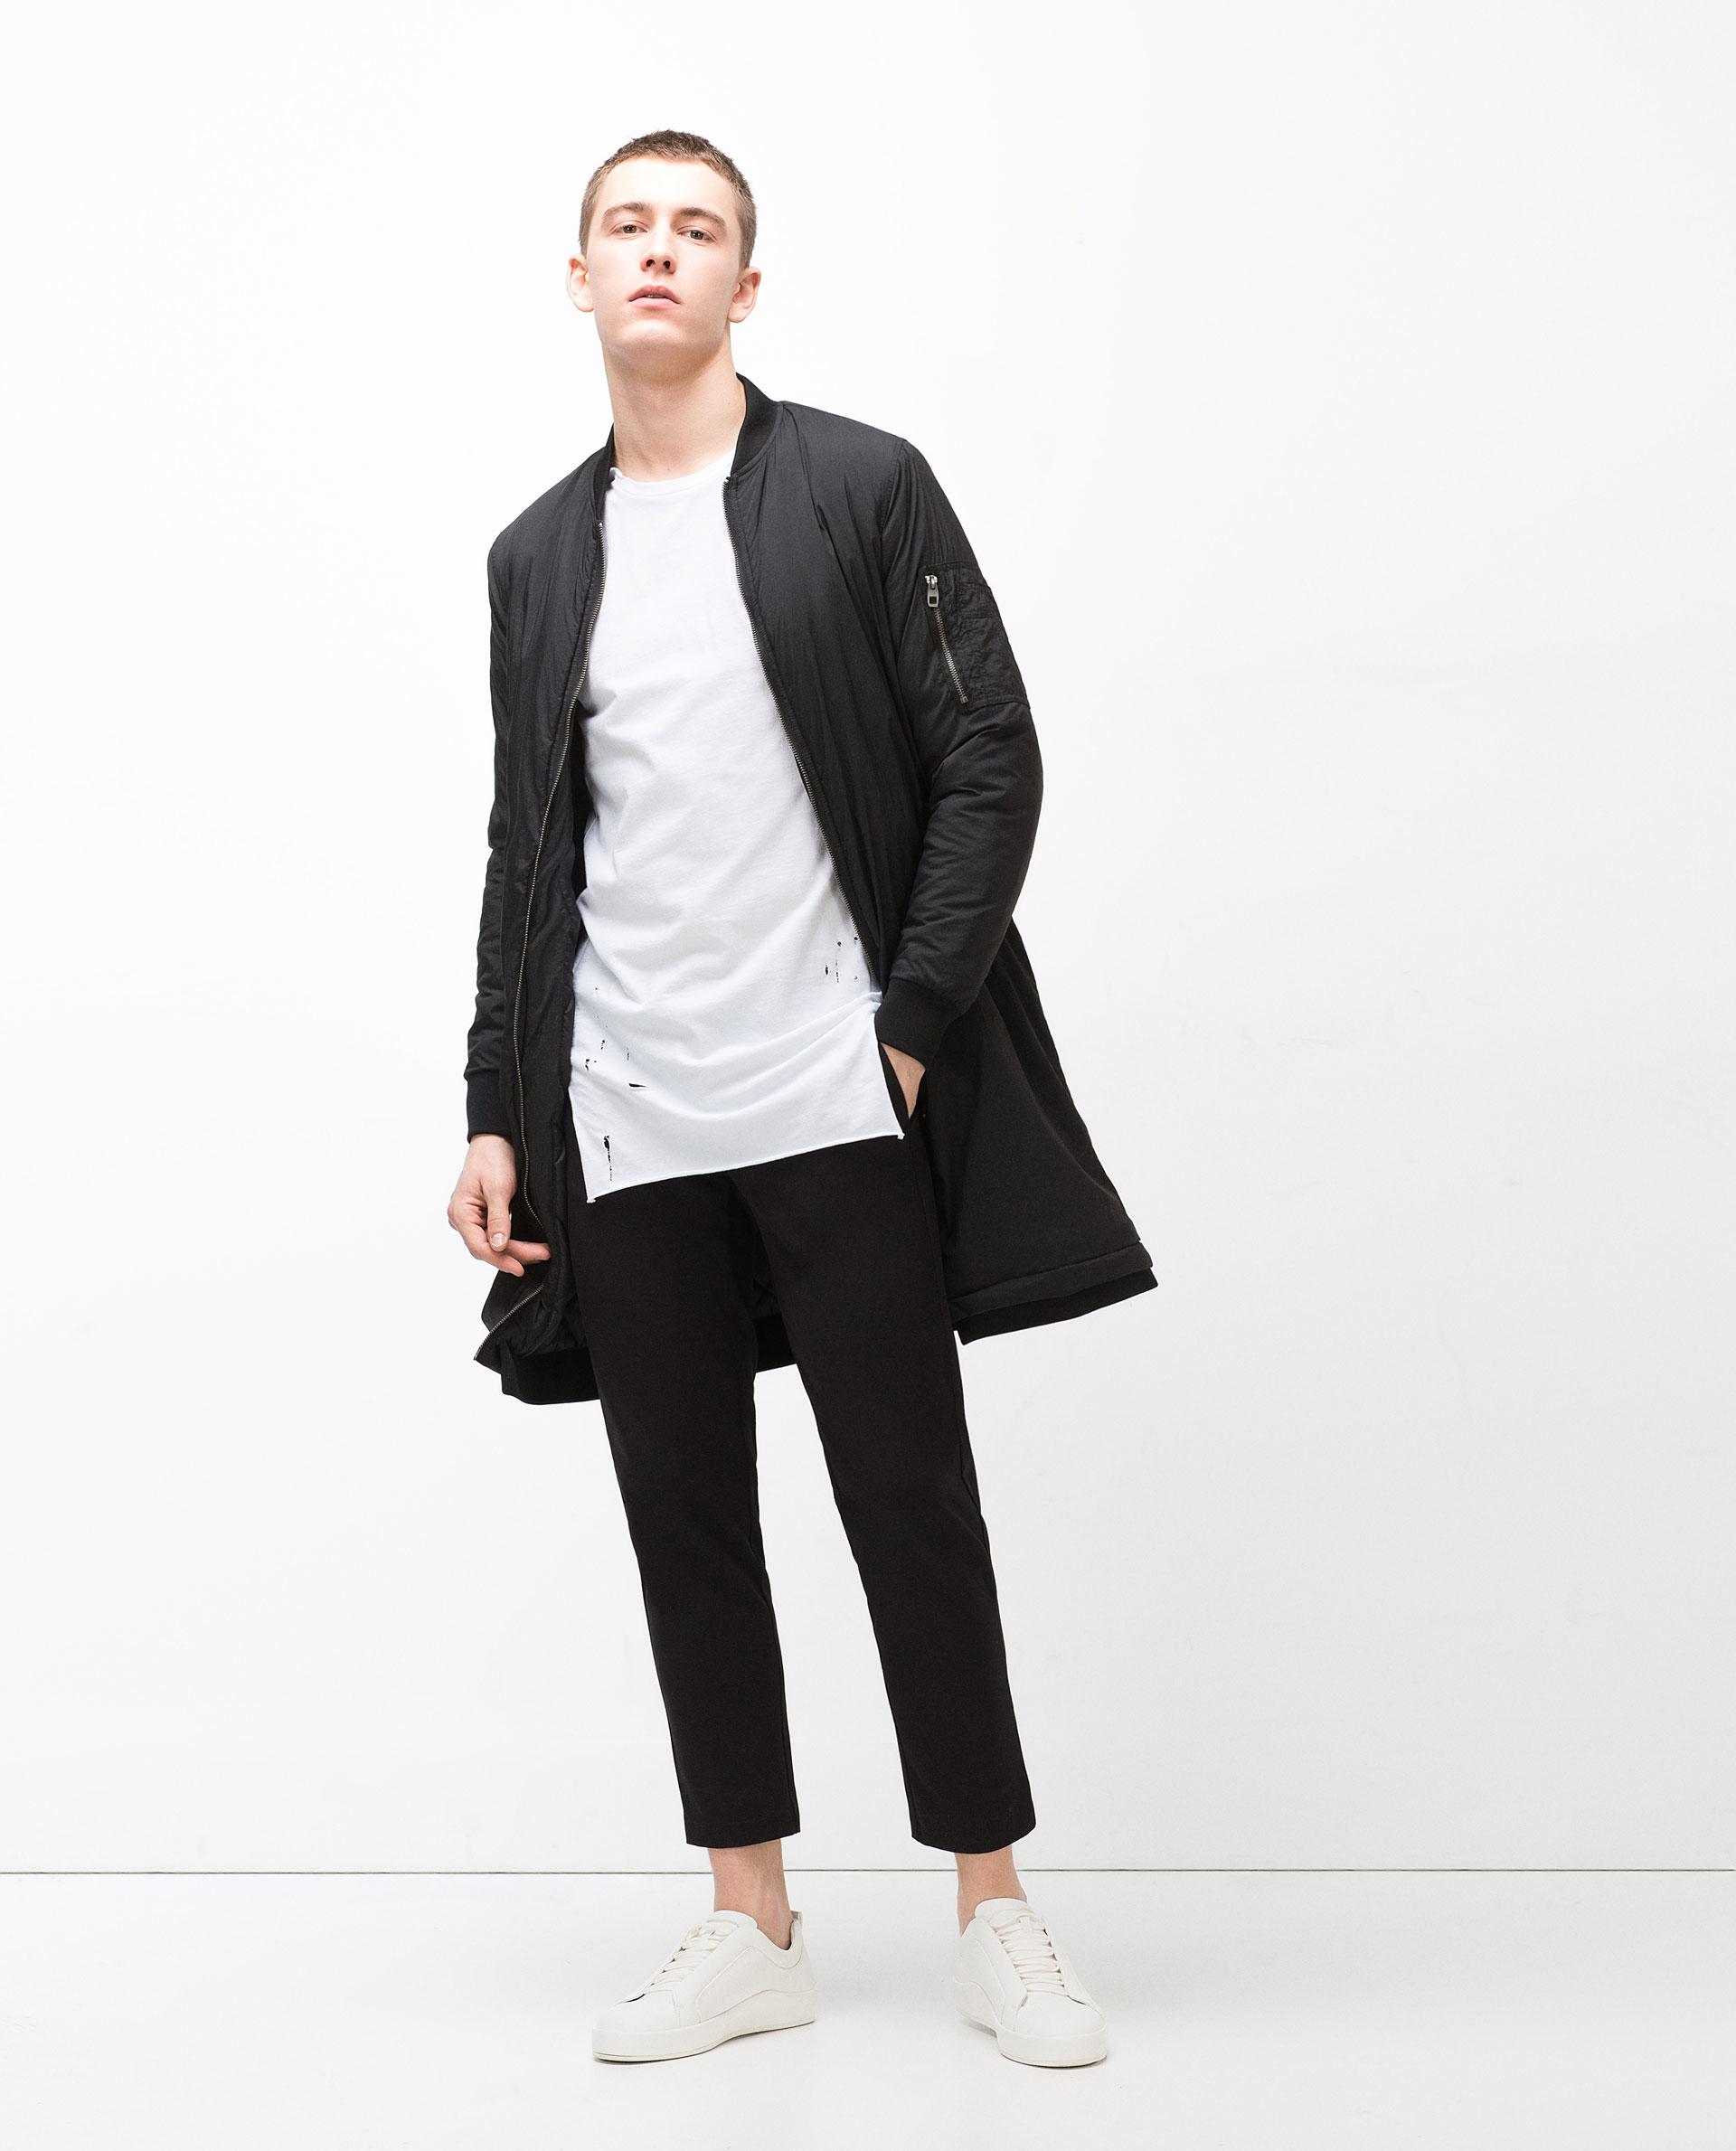 5a4d8598d3 Black Zara Man Bomber Jacket Trench coat Small Vintage